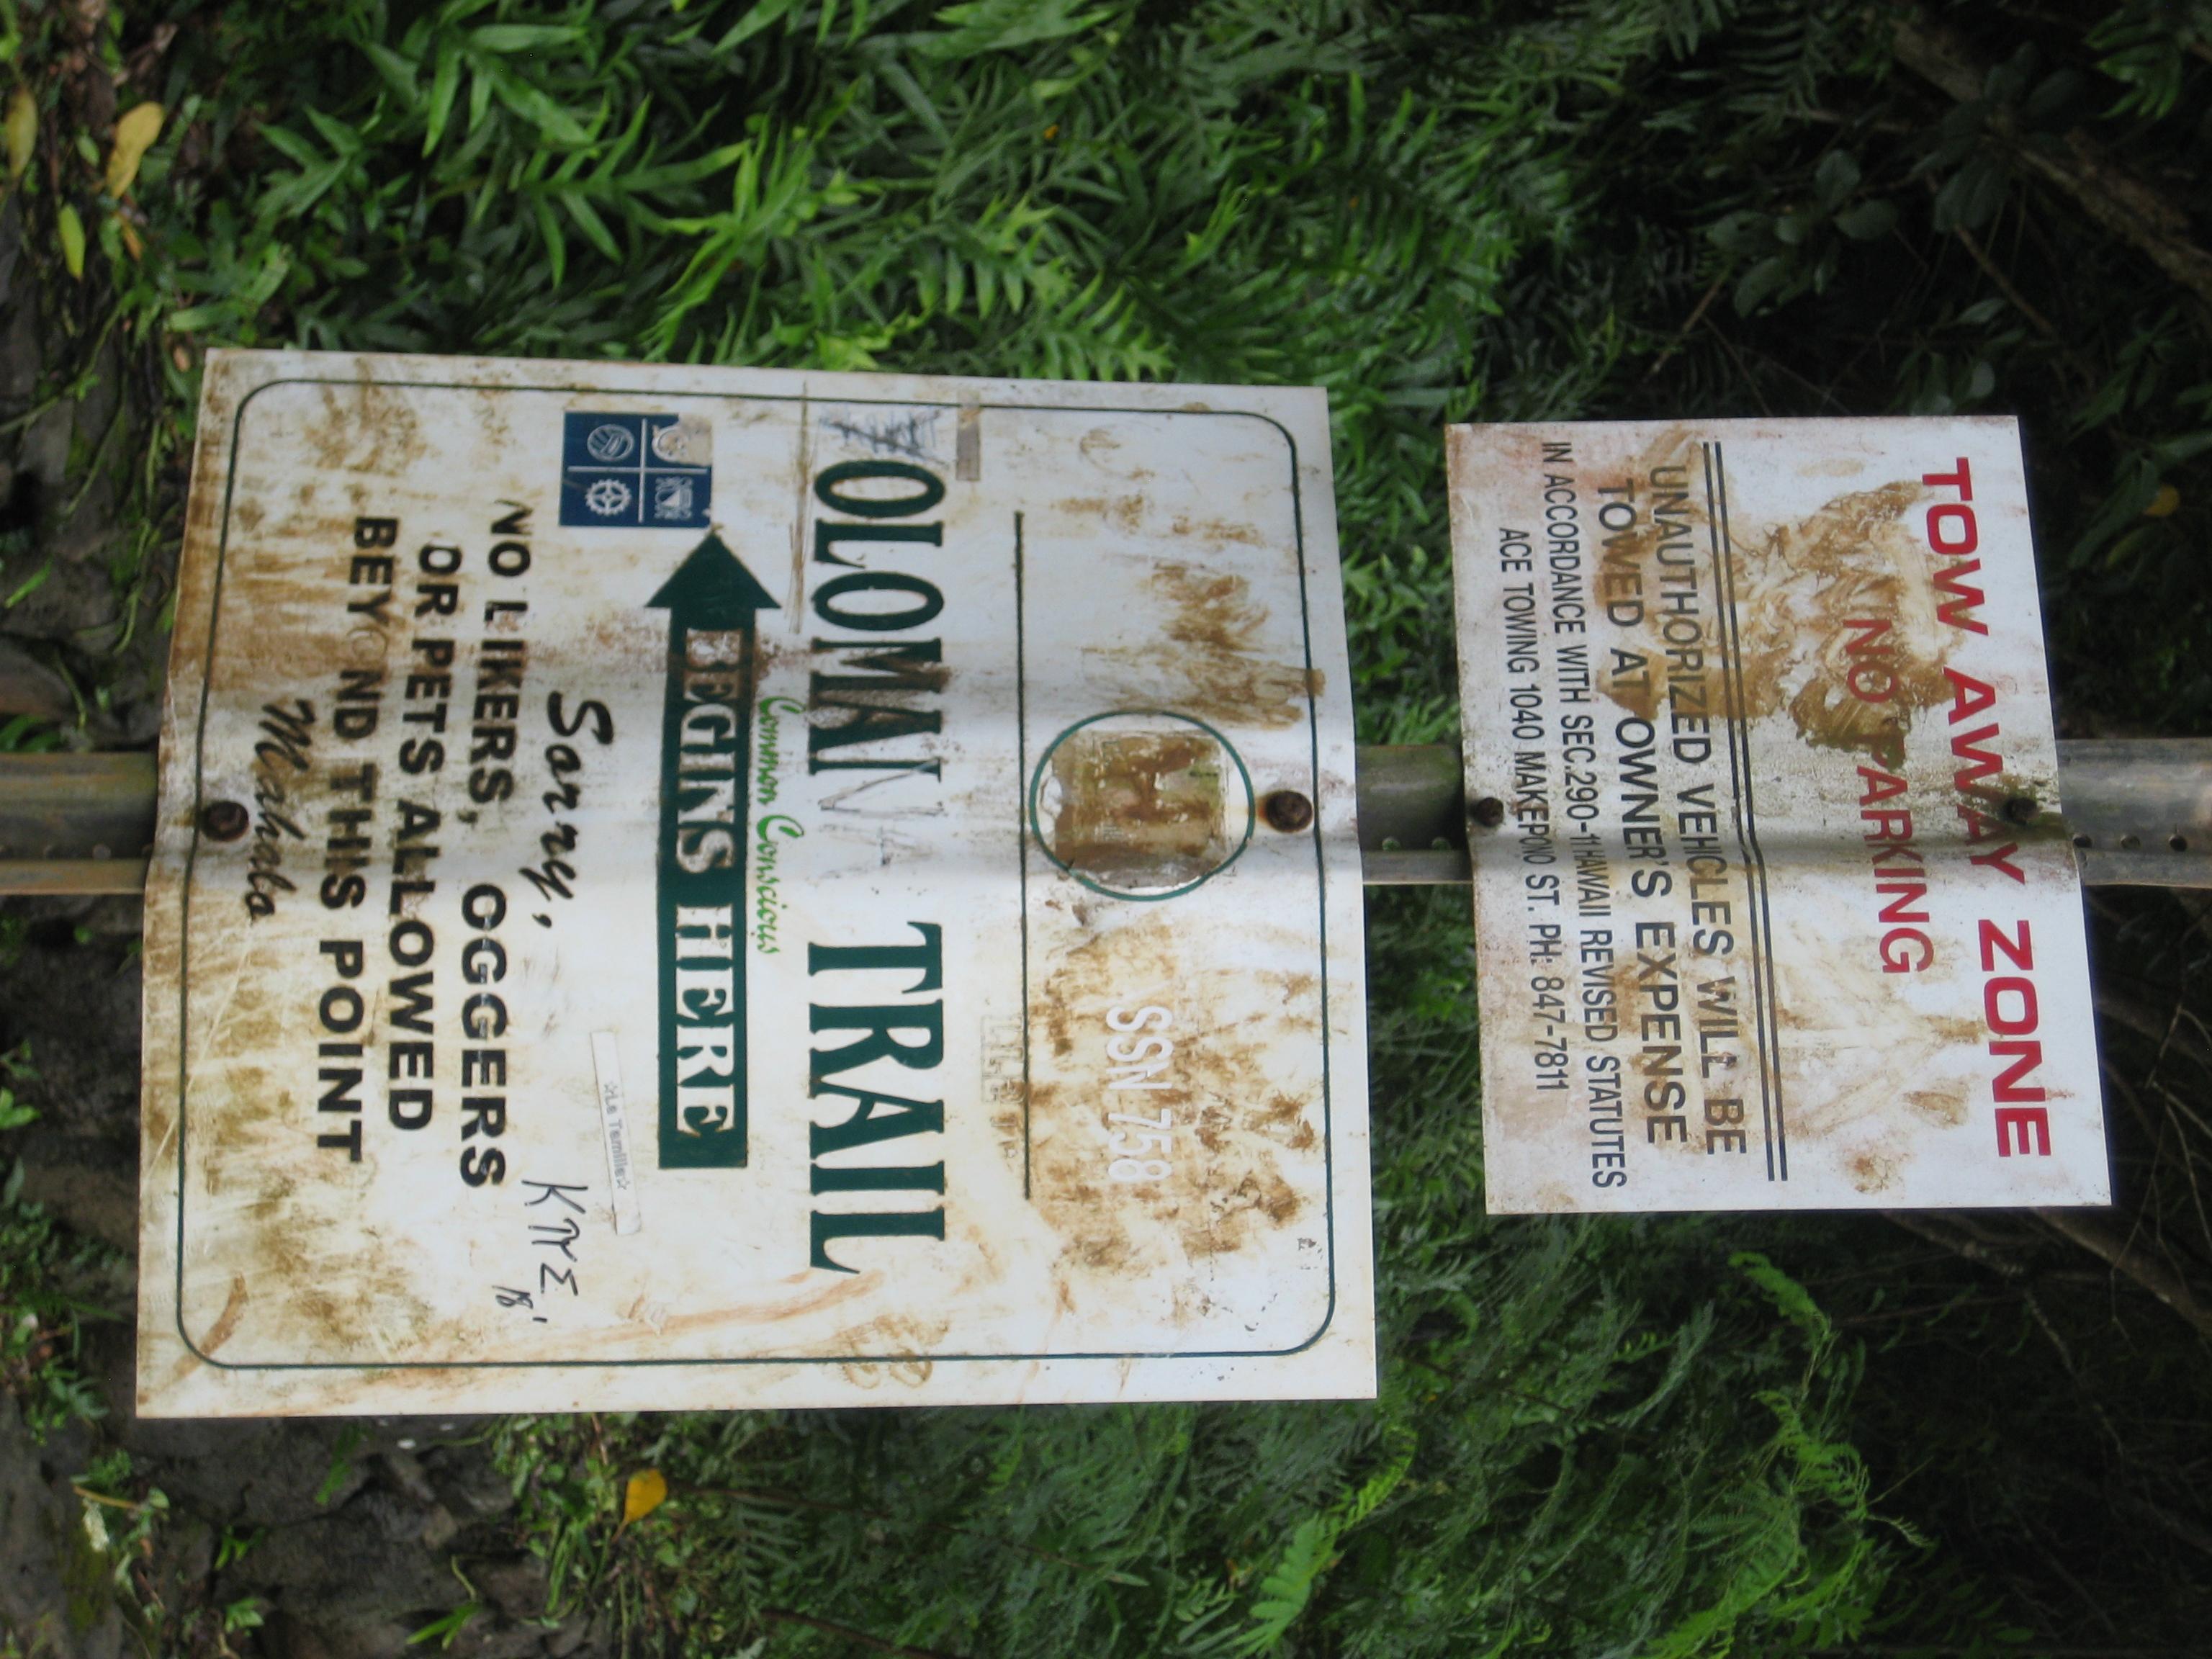 Hawai'i Hike of Death: Olomana - The Trek